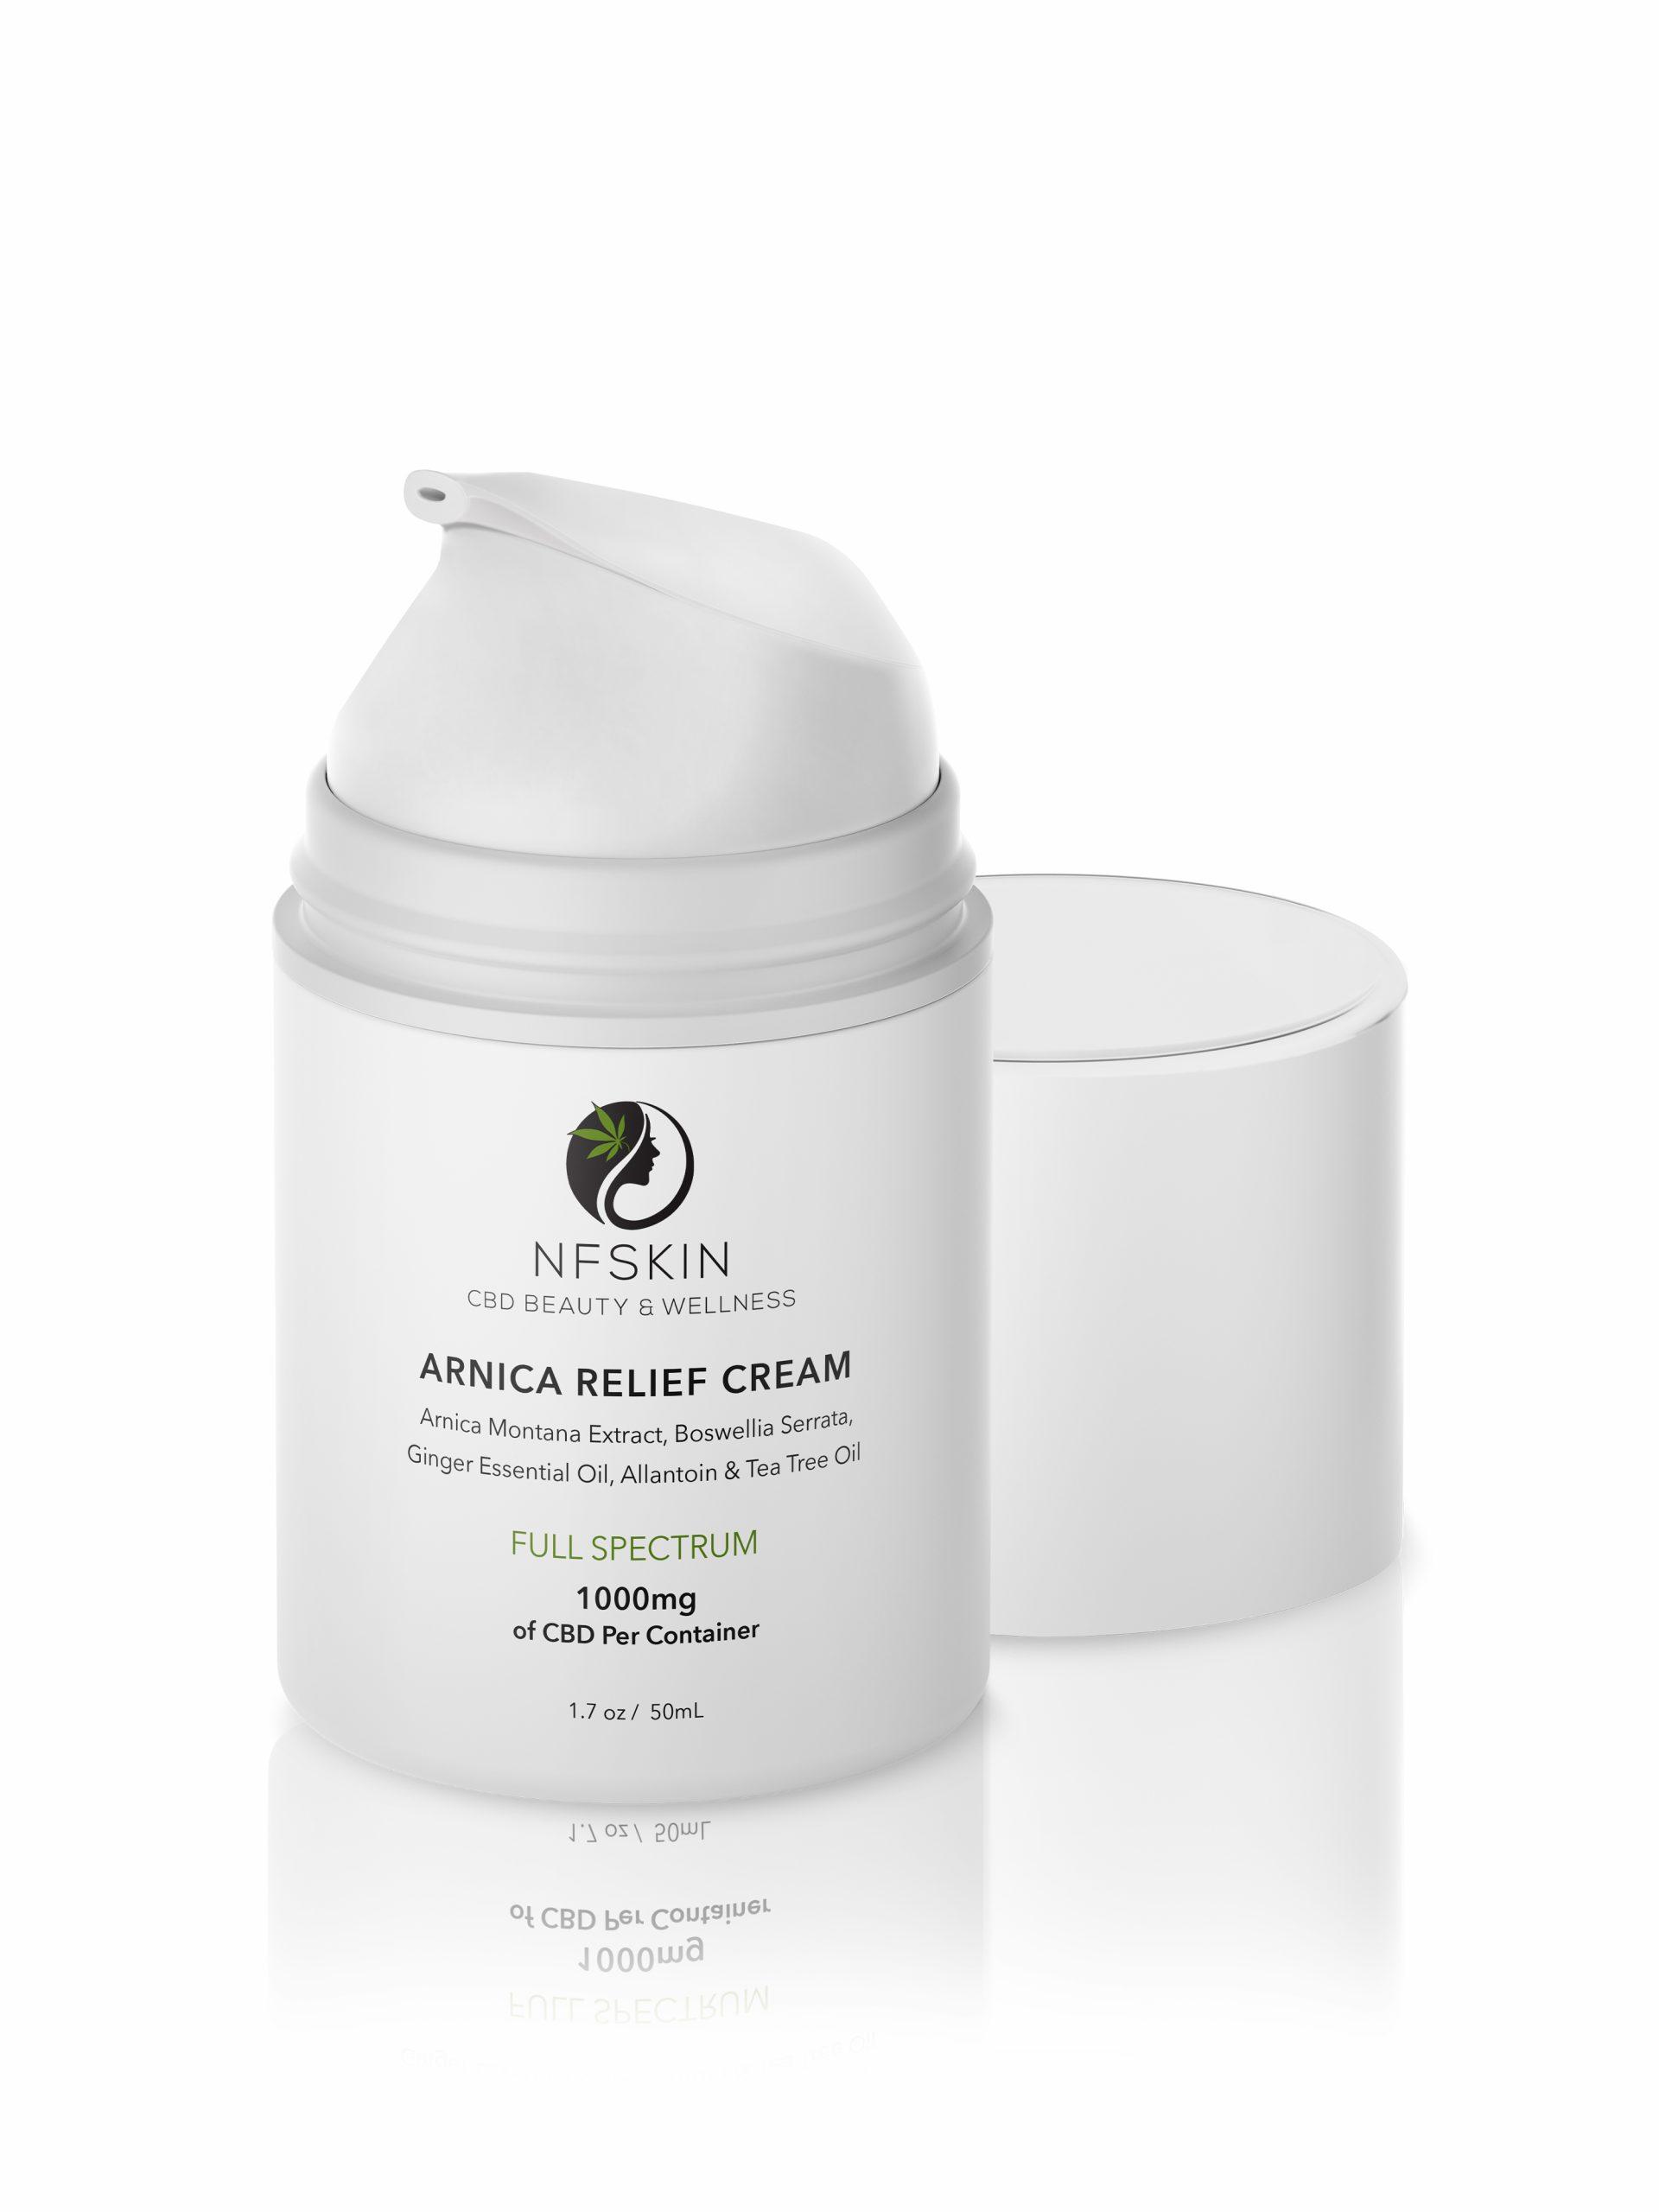 Arnica Relief Cream – 1000mg